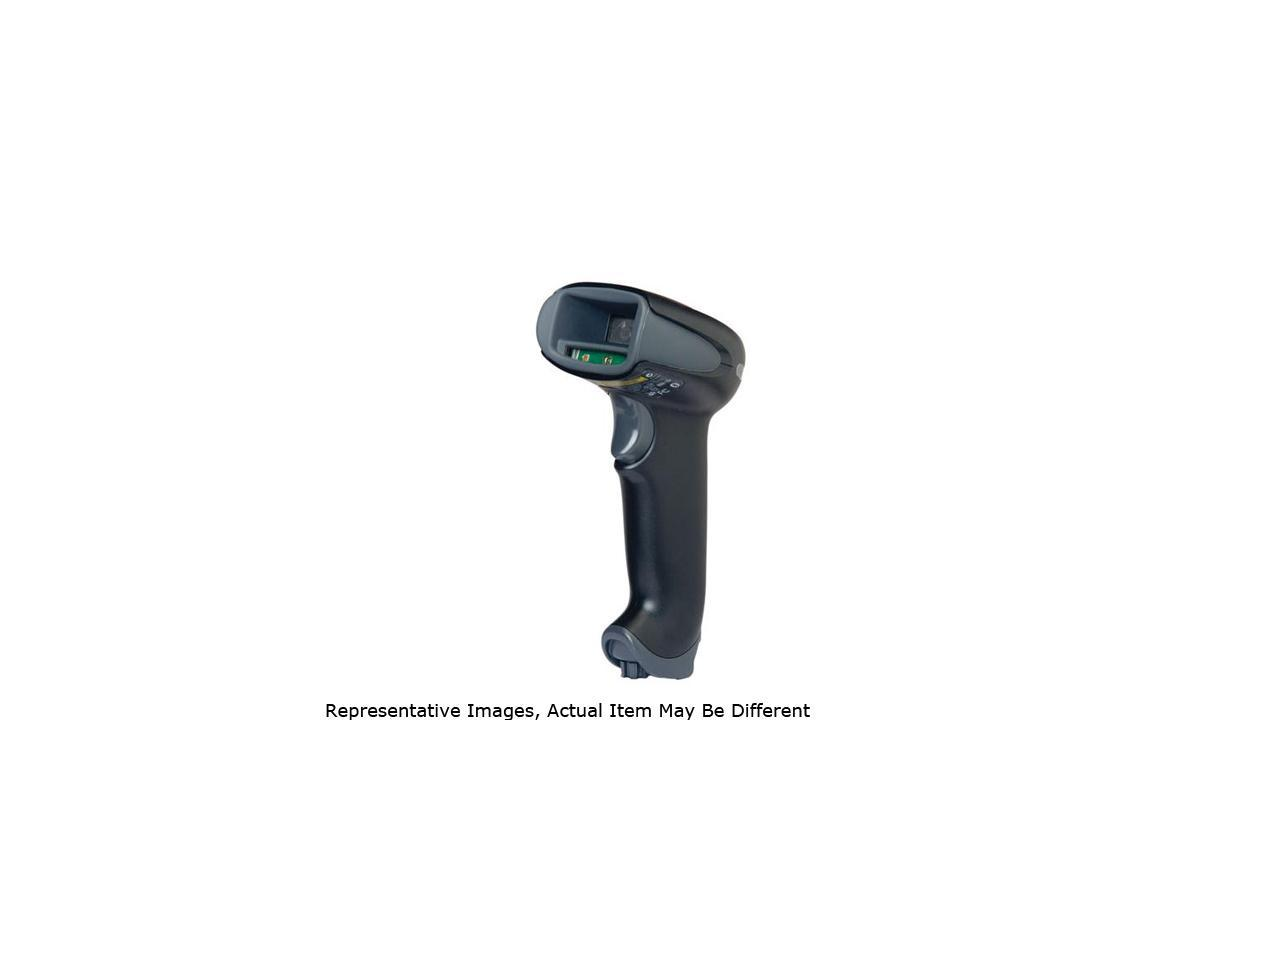 Black Scanner Only Honeywell Xenon 1902 Handheld Bar Code Reader 1902GSR-2